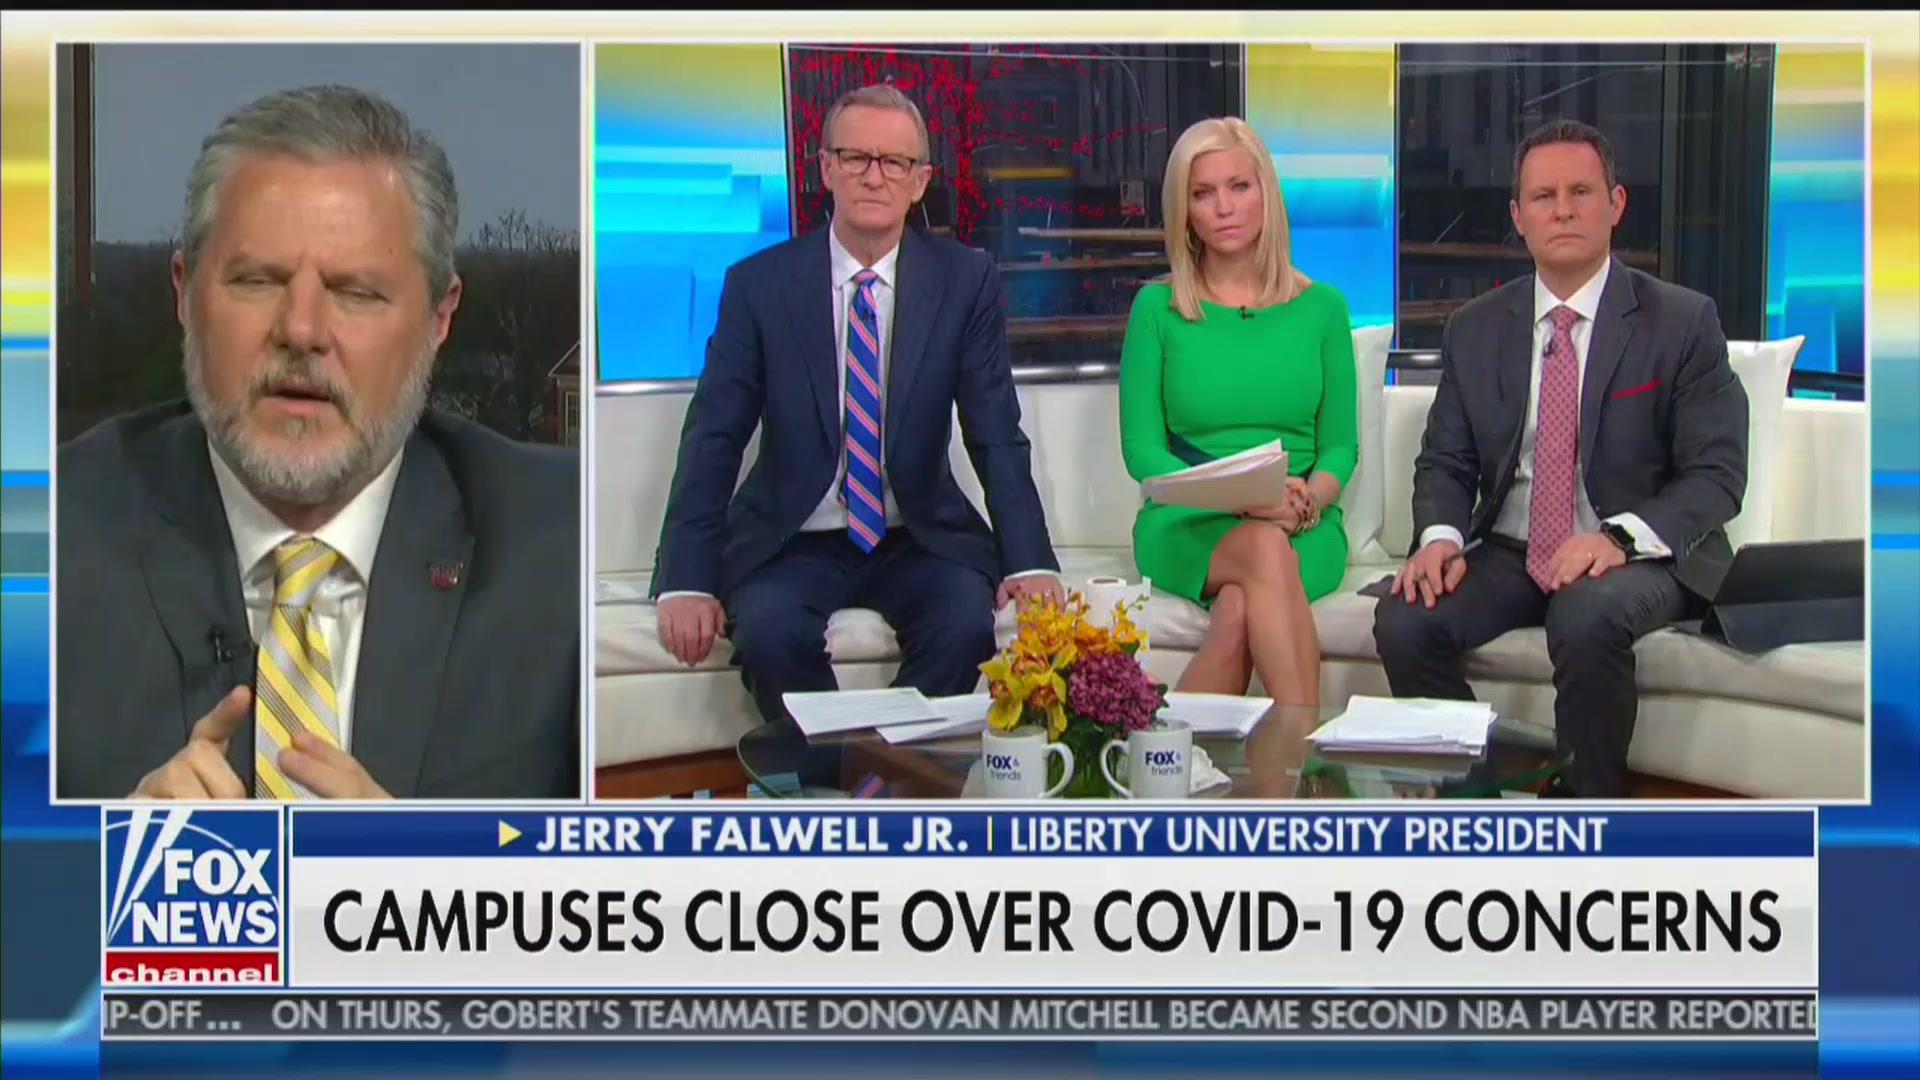 Fox & Friends Hosts Don't Push Back After Jerry Falwell Jr. Suggests North Korea Developed Coronavirus